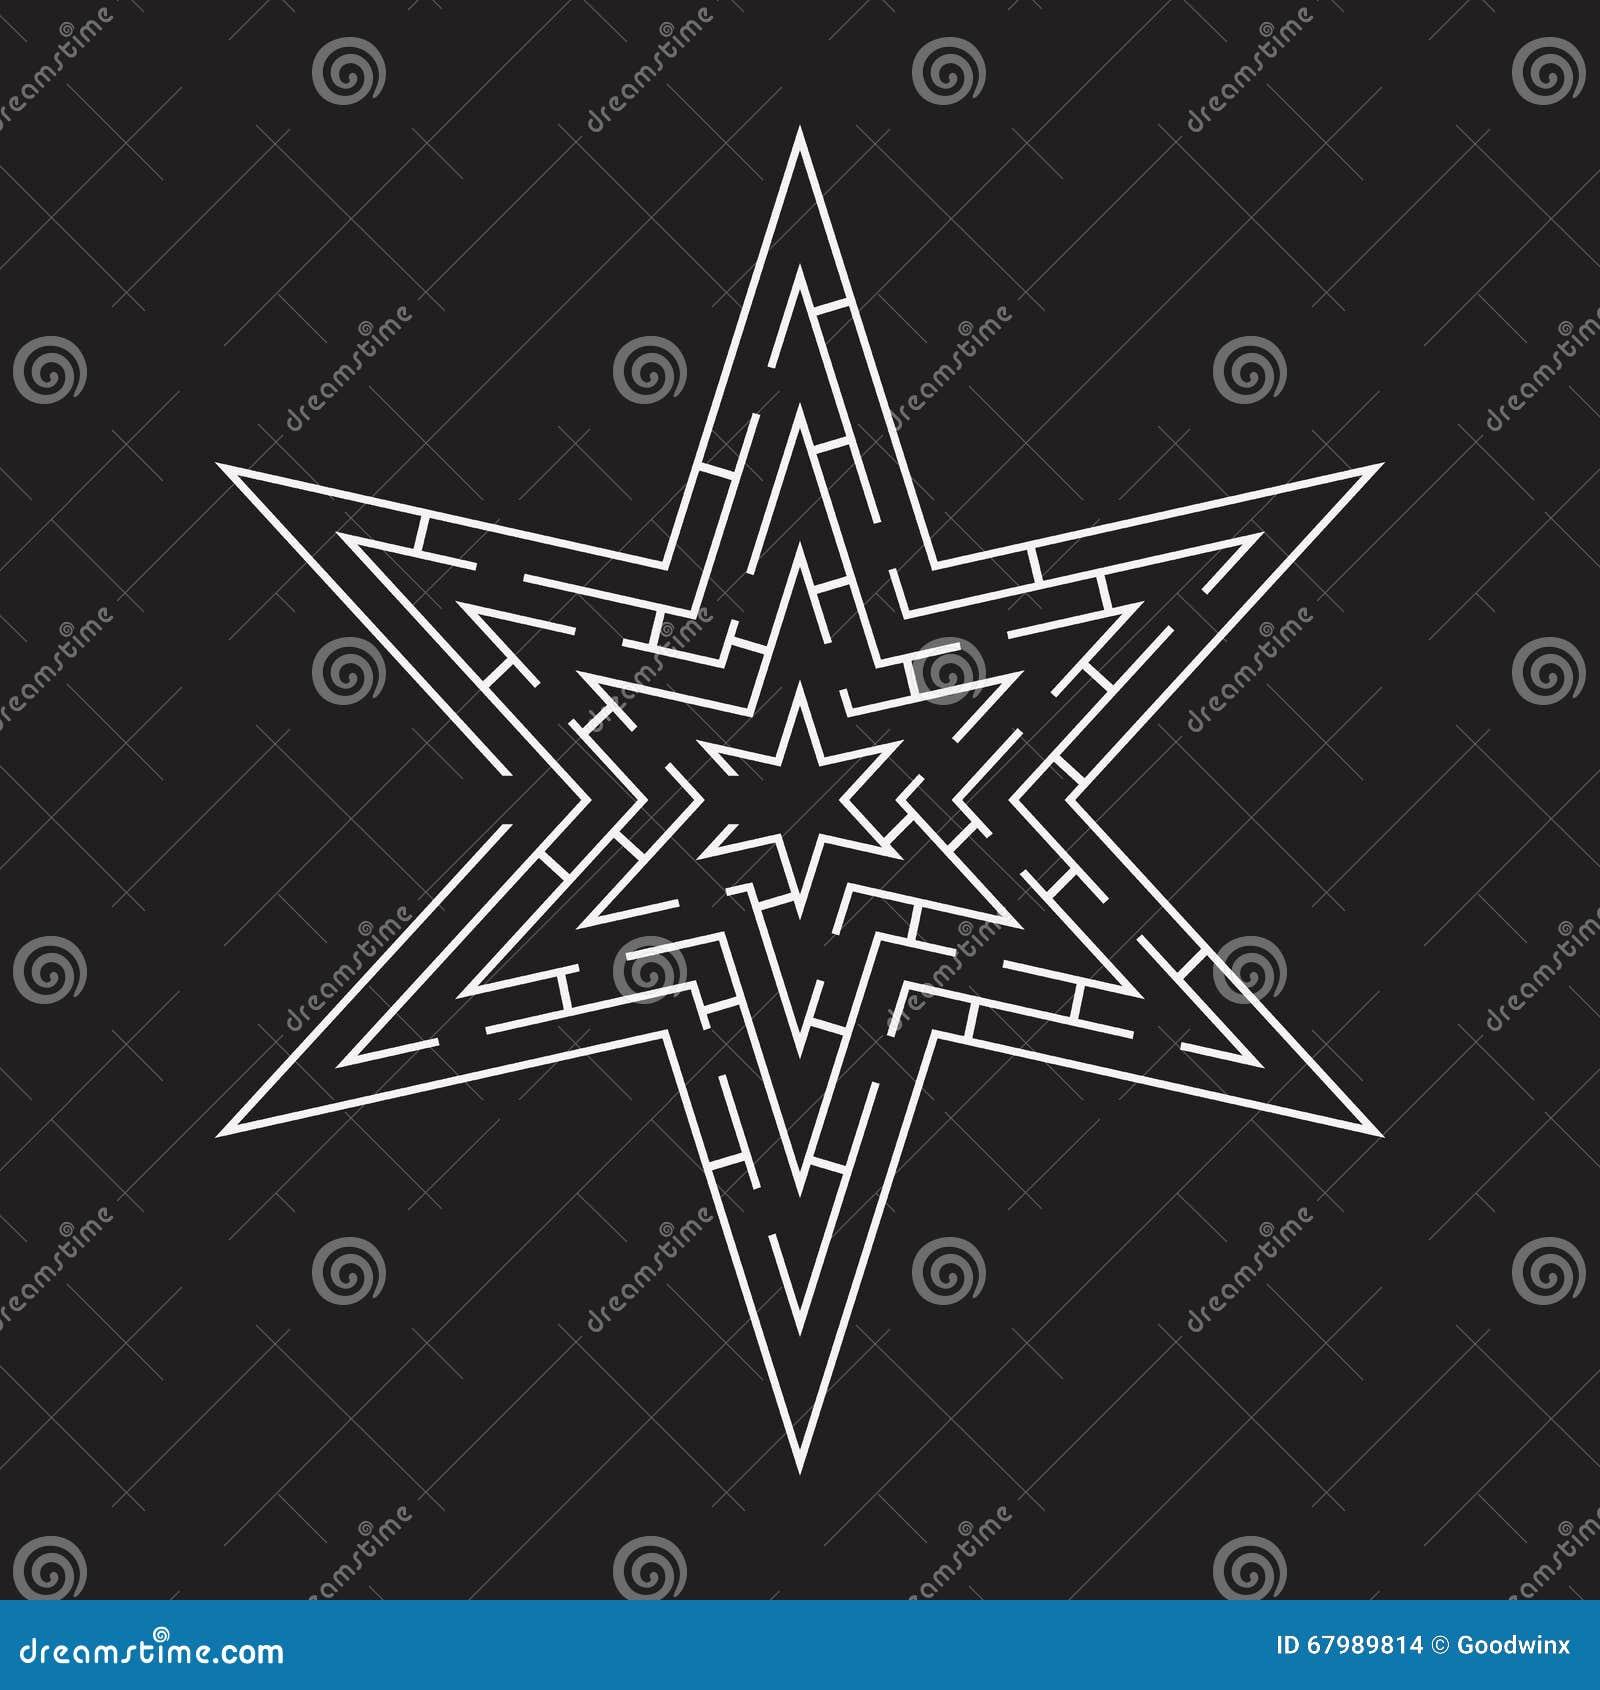 Maze Puzzle A Star Shape Black Stock Vector - Illustration ...